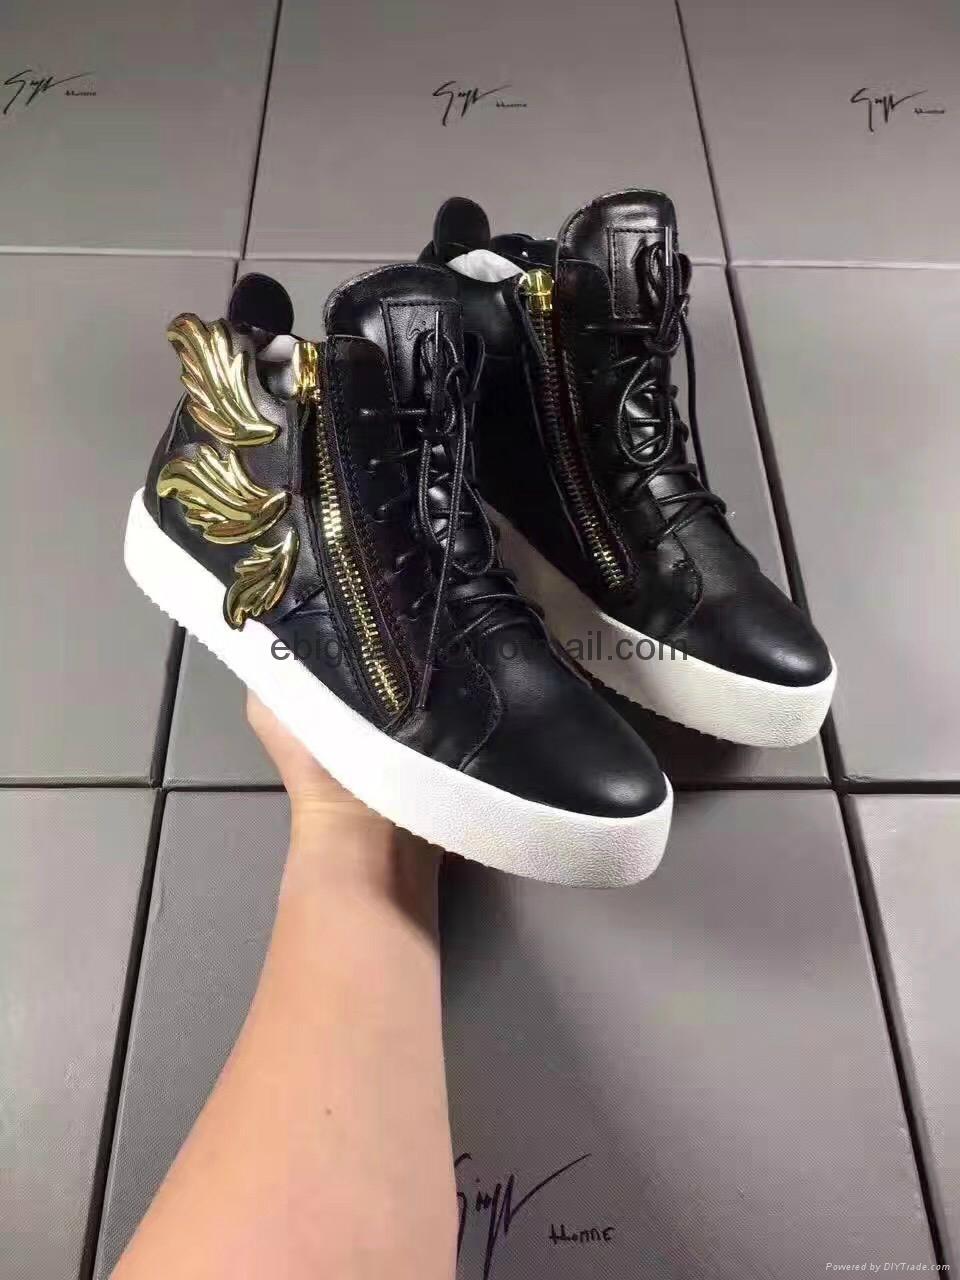 Giuseppe Zanotti sneakers for sale